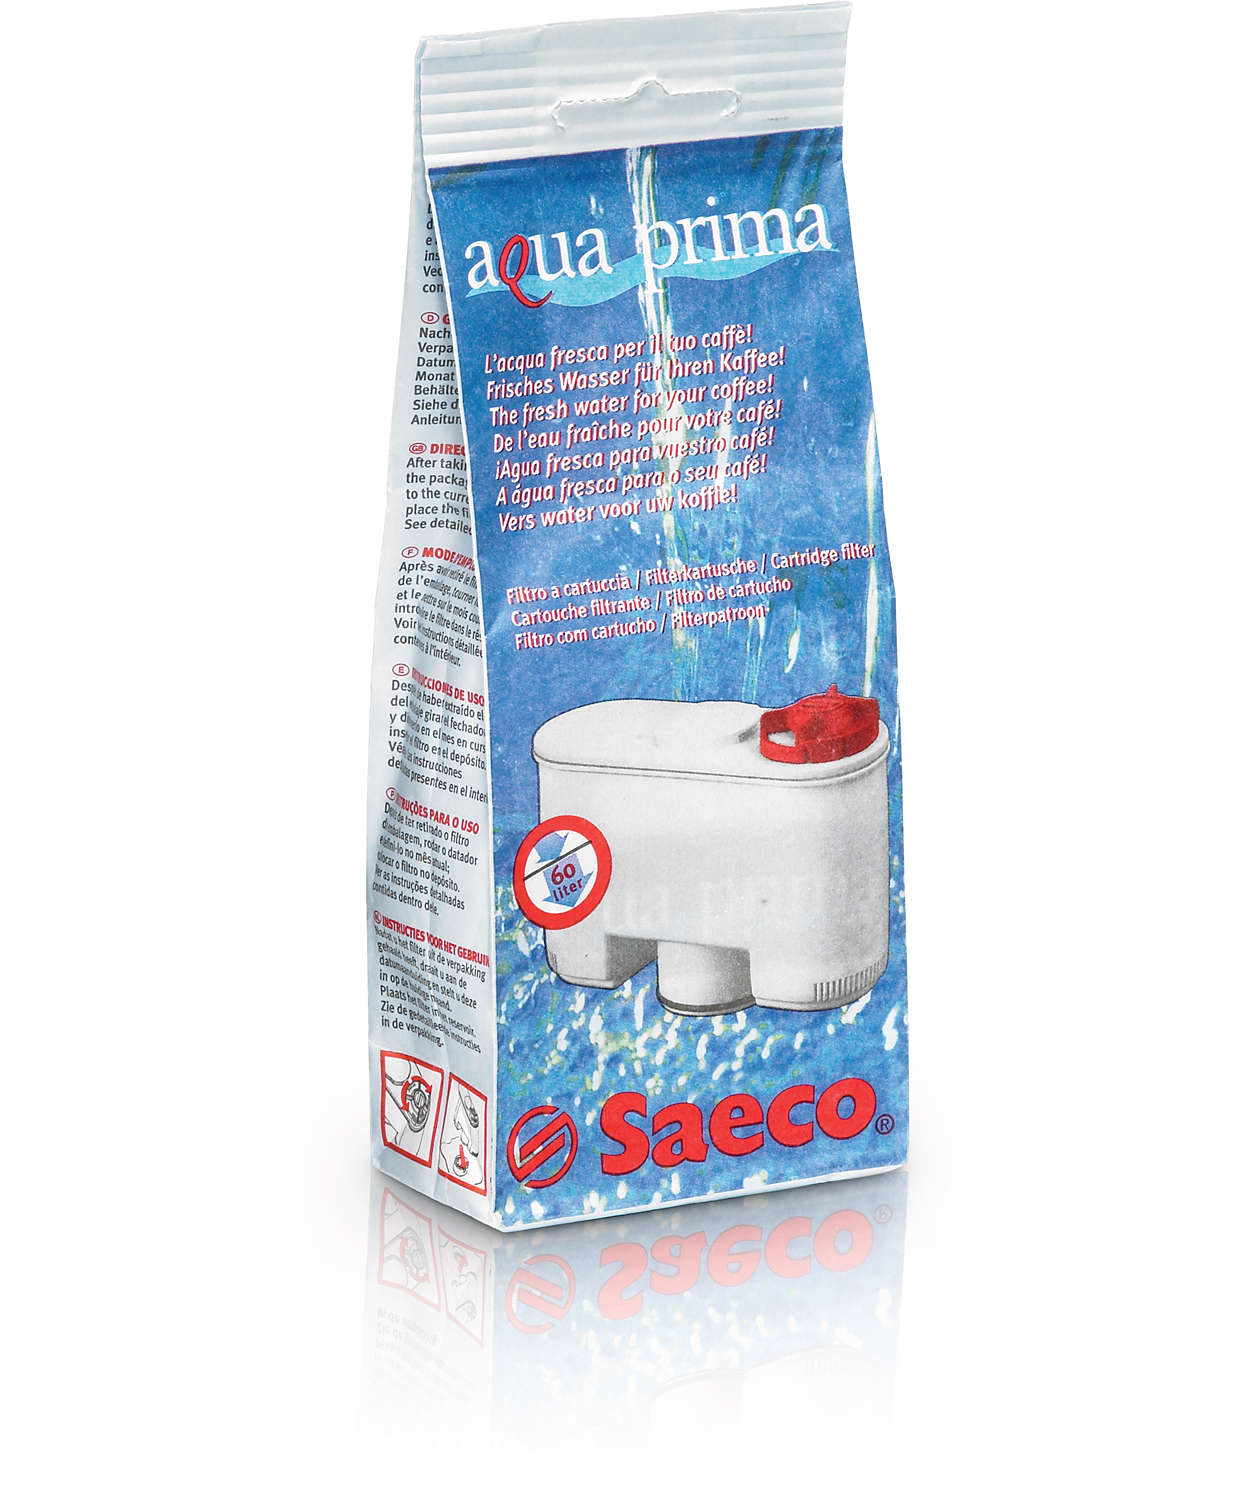 Un café más sabroso gracias a un agua mejor